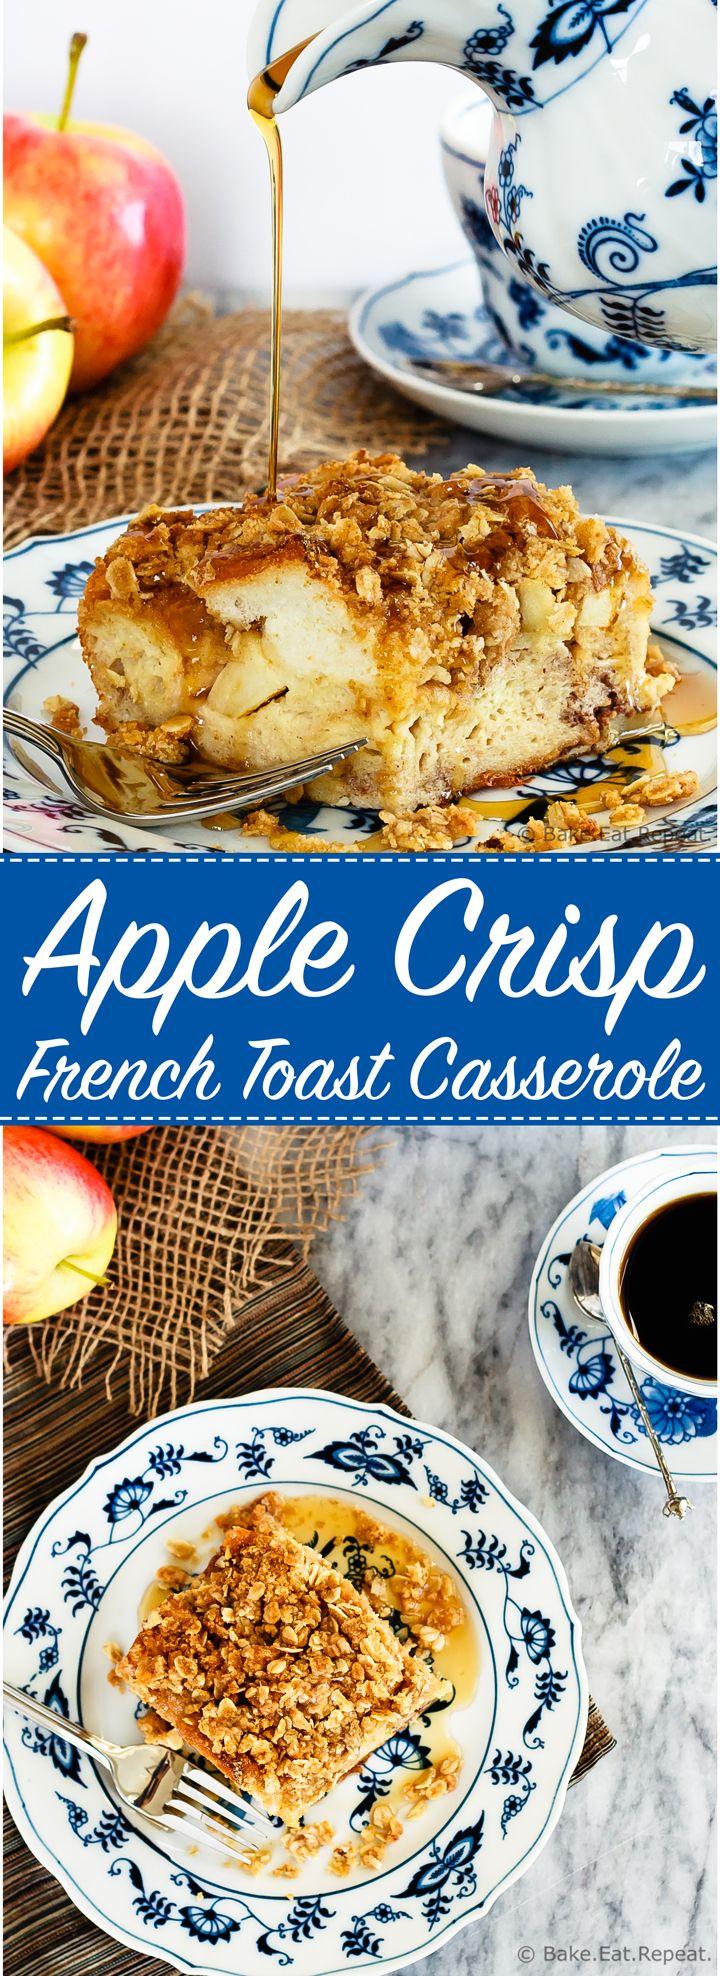 Apple Crisp French Toast Casserole